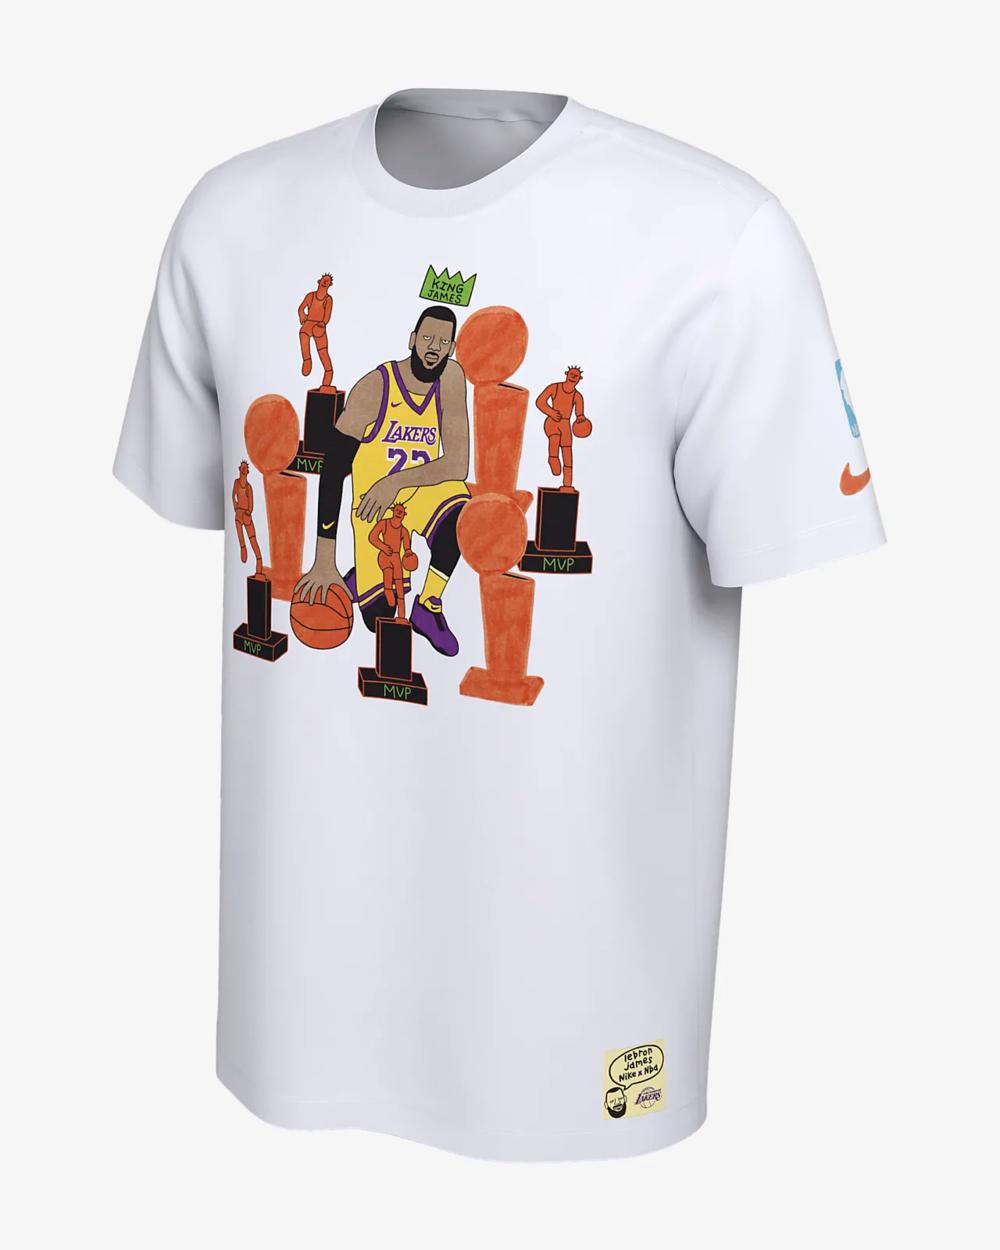 gangster-doodles-king-james-mens-nba-nickname-t-shirt-TNXtb5.png